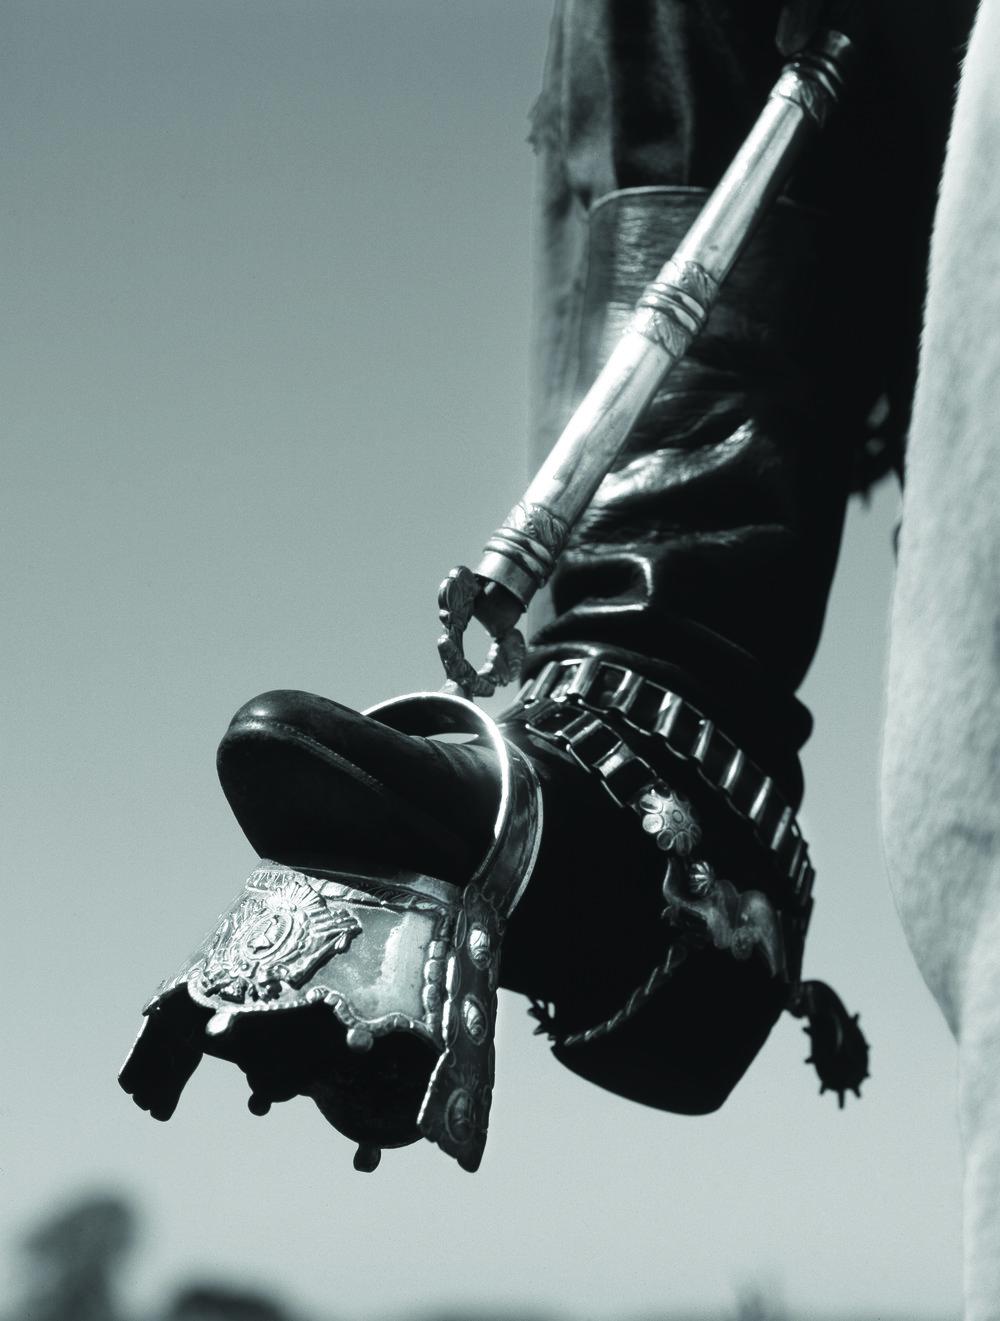 Detail of a silver knife sheath, made by silversmith Juan Carlos Pallarols, Buenos Aires.Photo by ©Aldo Sessa.